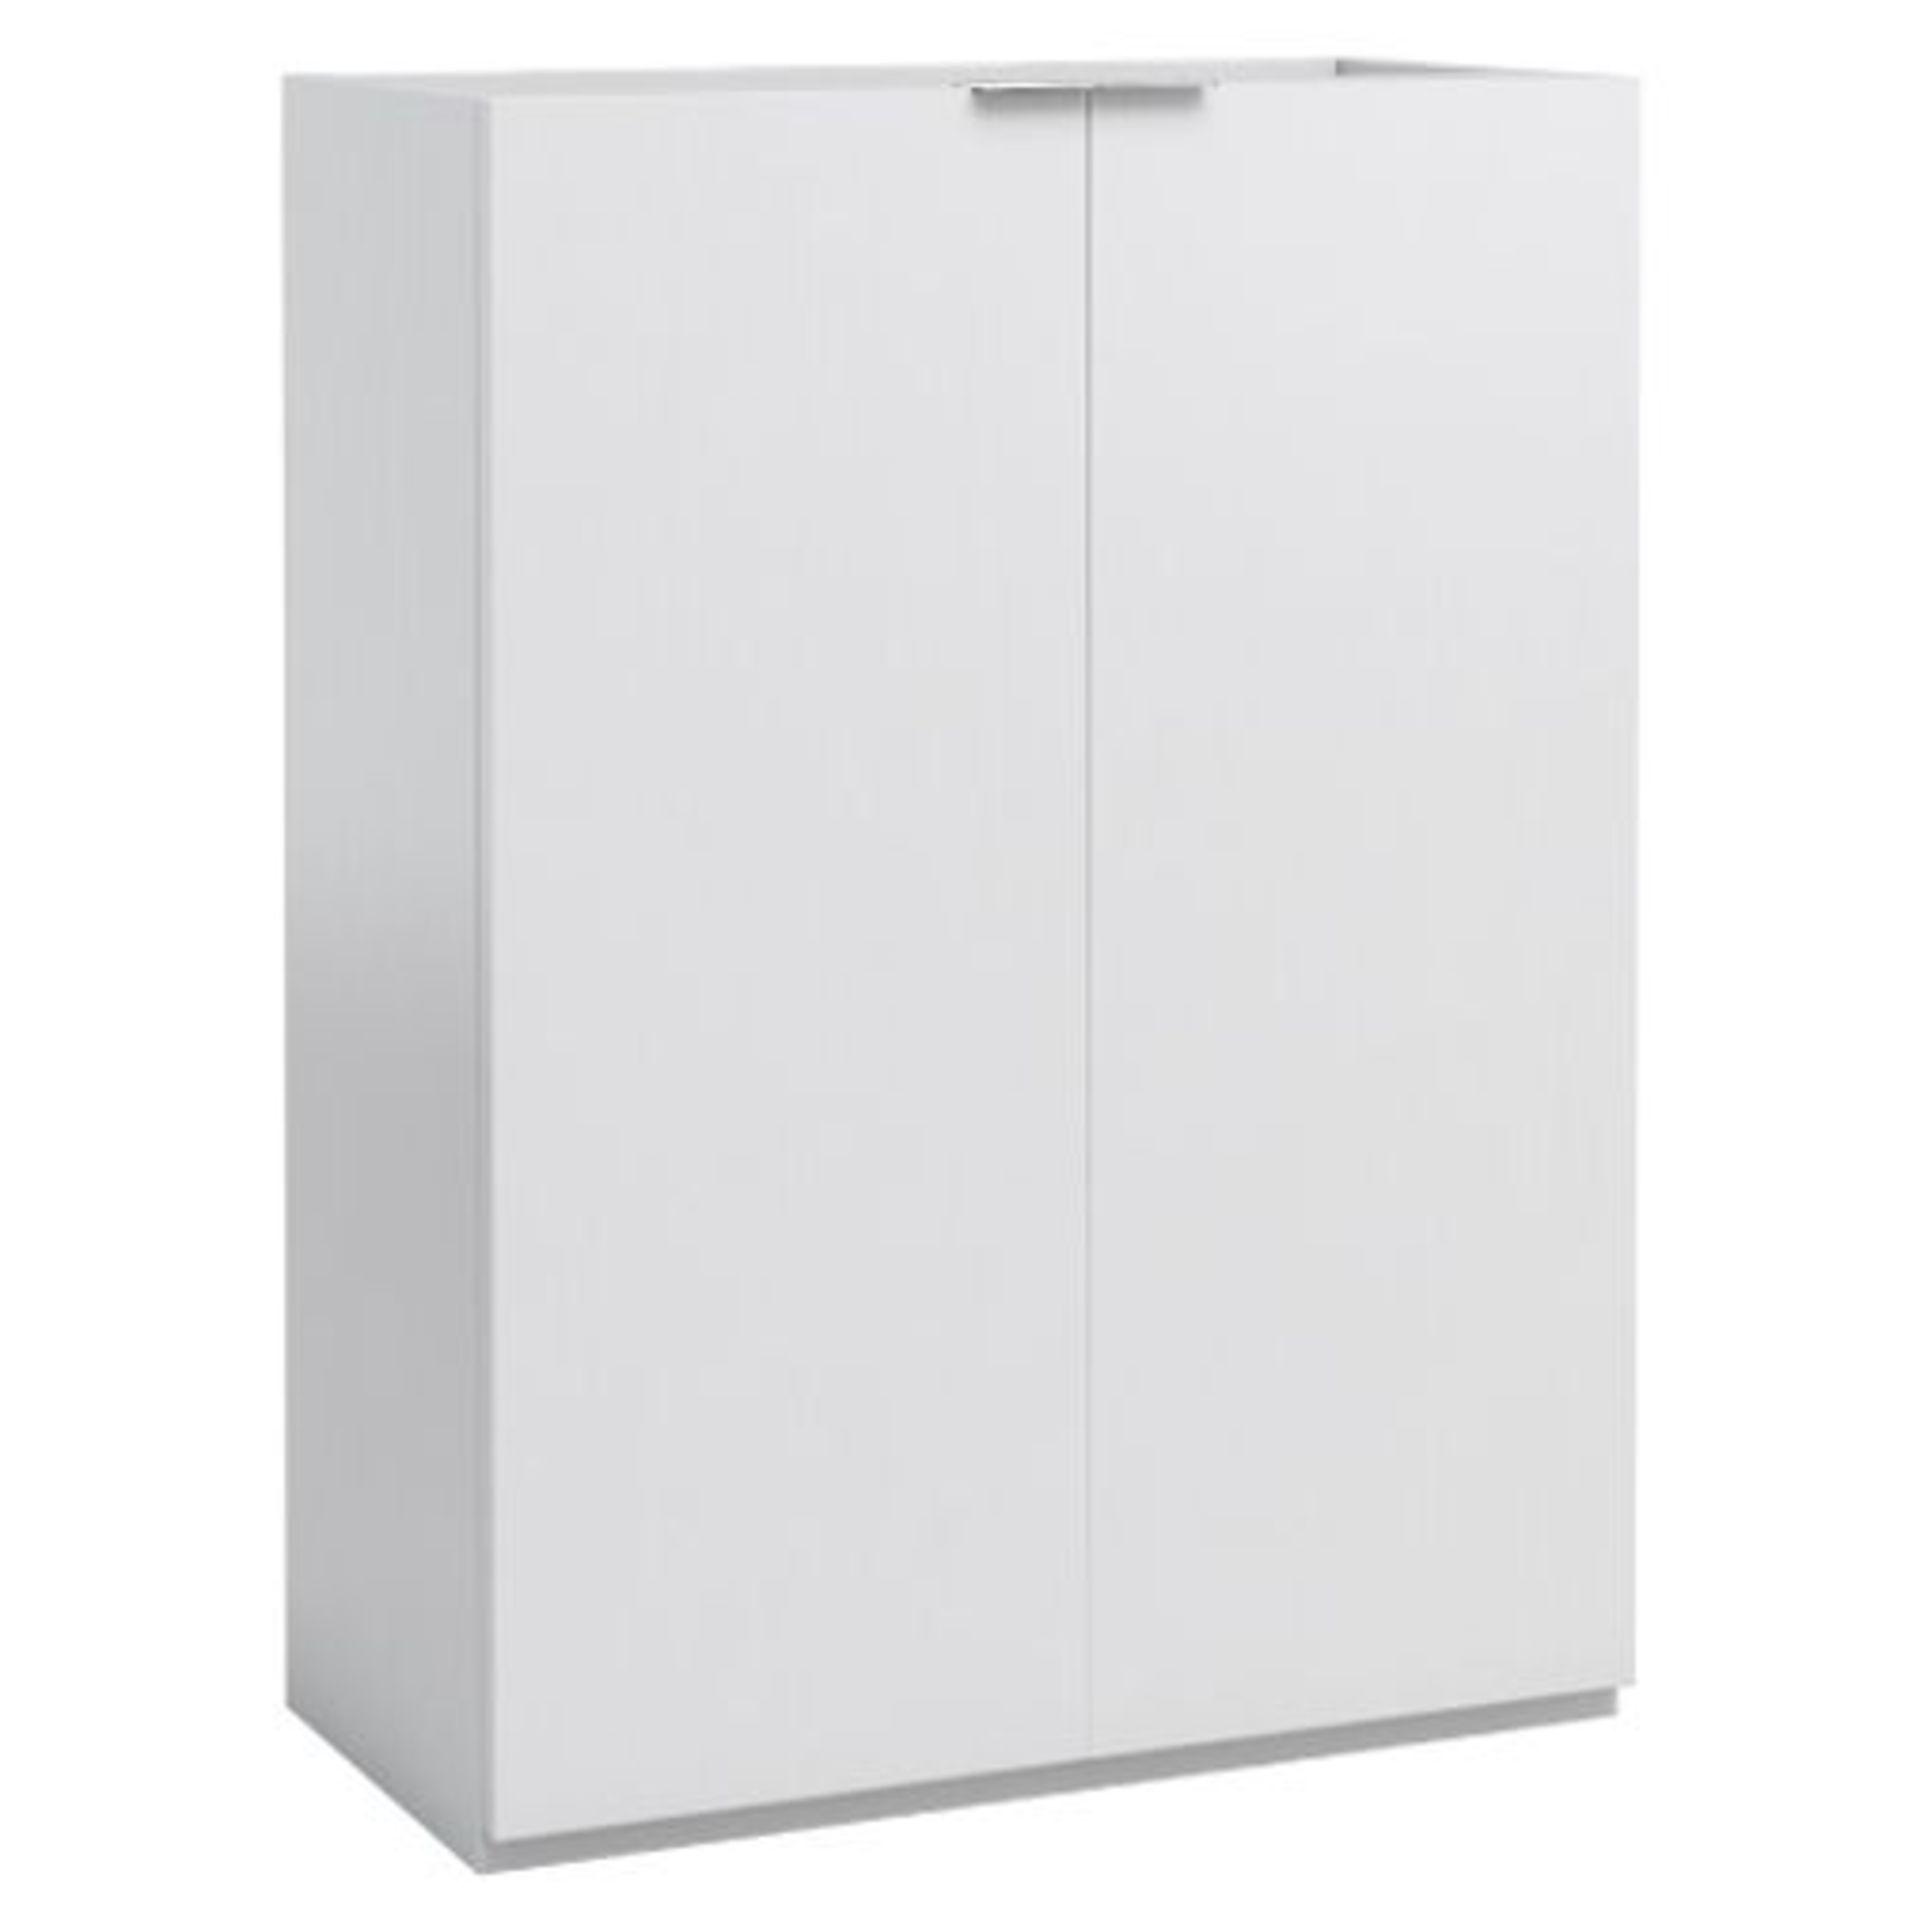 Lot 10 - MYPLAN' 600MM BASIN UNIT IN ARTIC WHITE. W600 X D450 X H715MM RRP £375